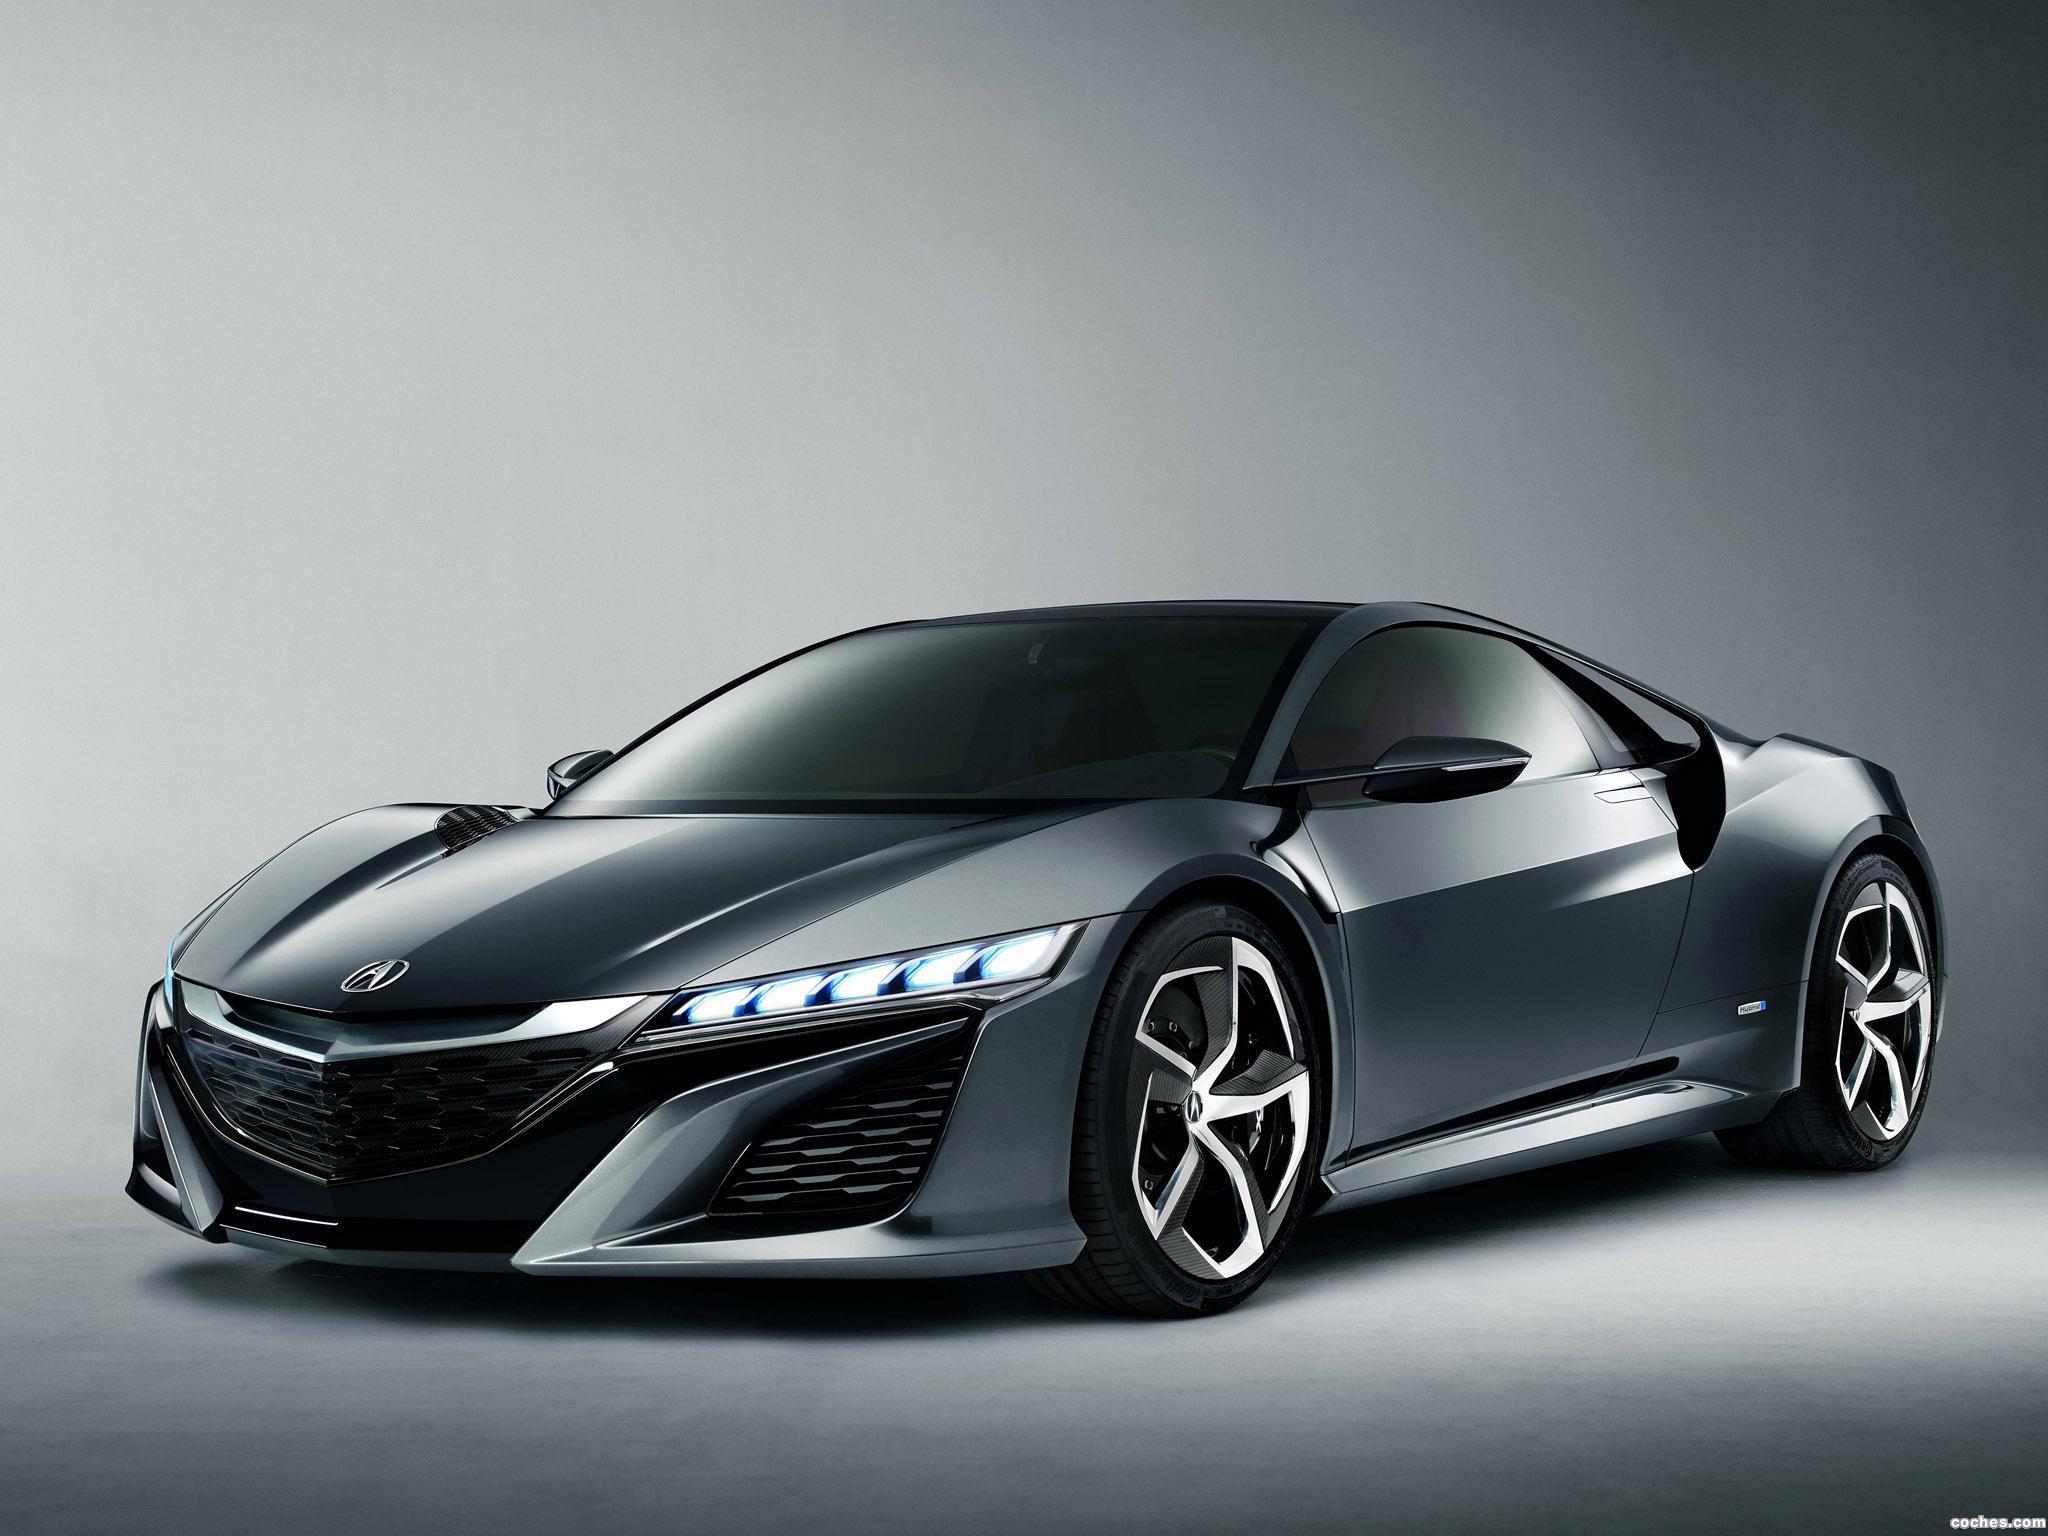 Foto 0 de Acura NSX Concept 2013